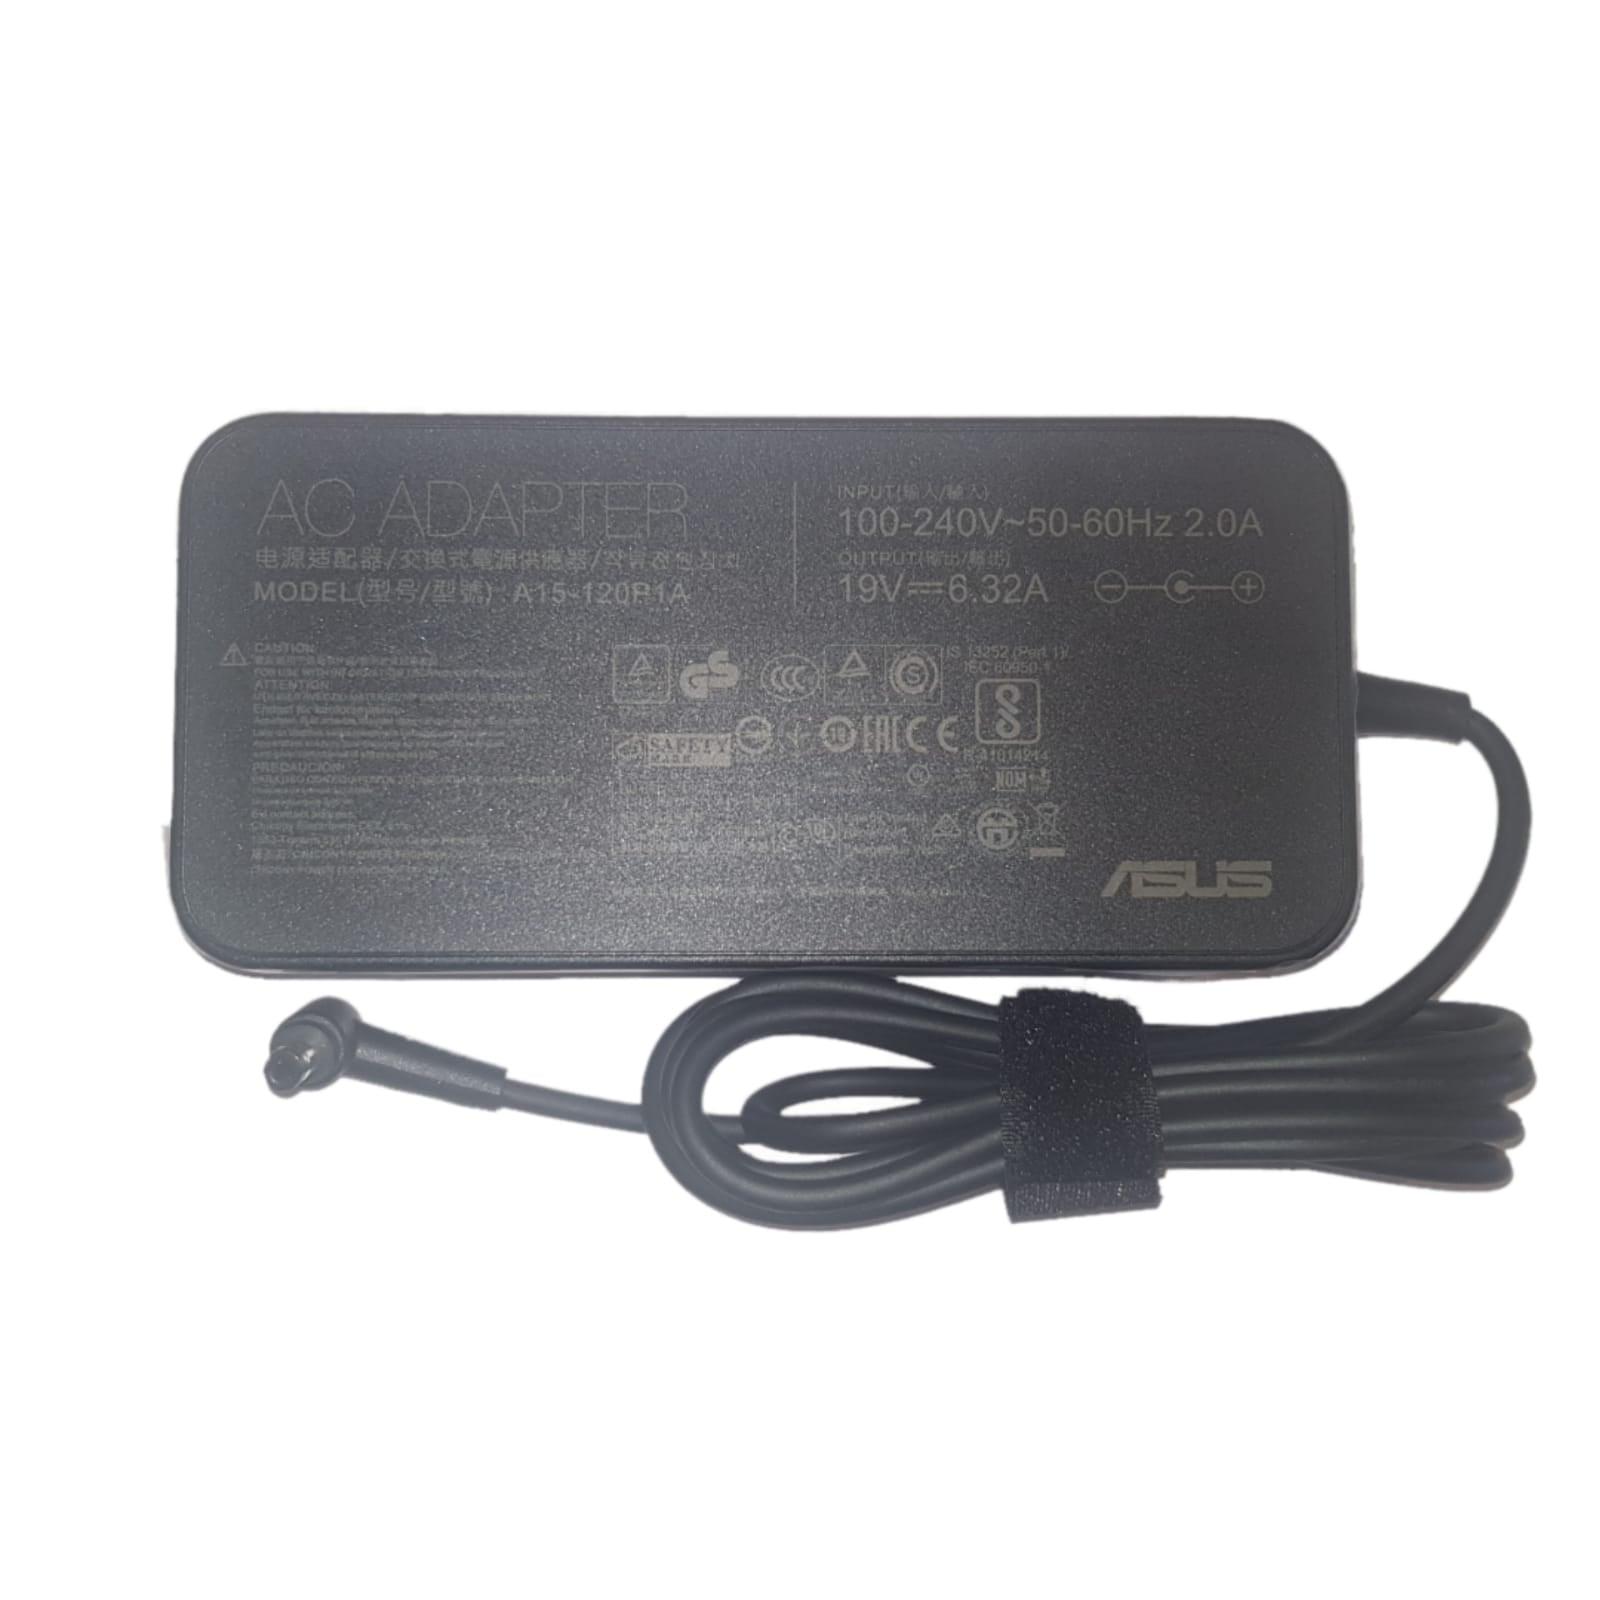 מטען למחשב נייד אסוס Asus N551JK